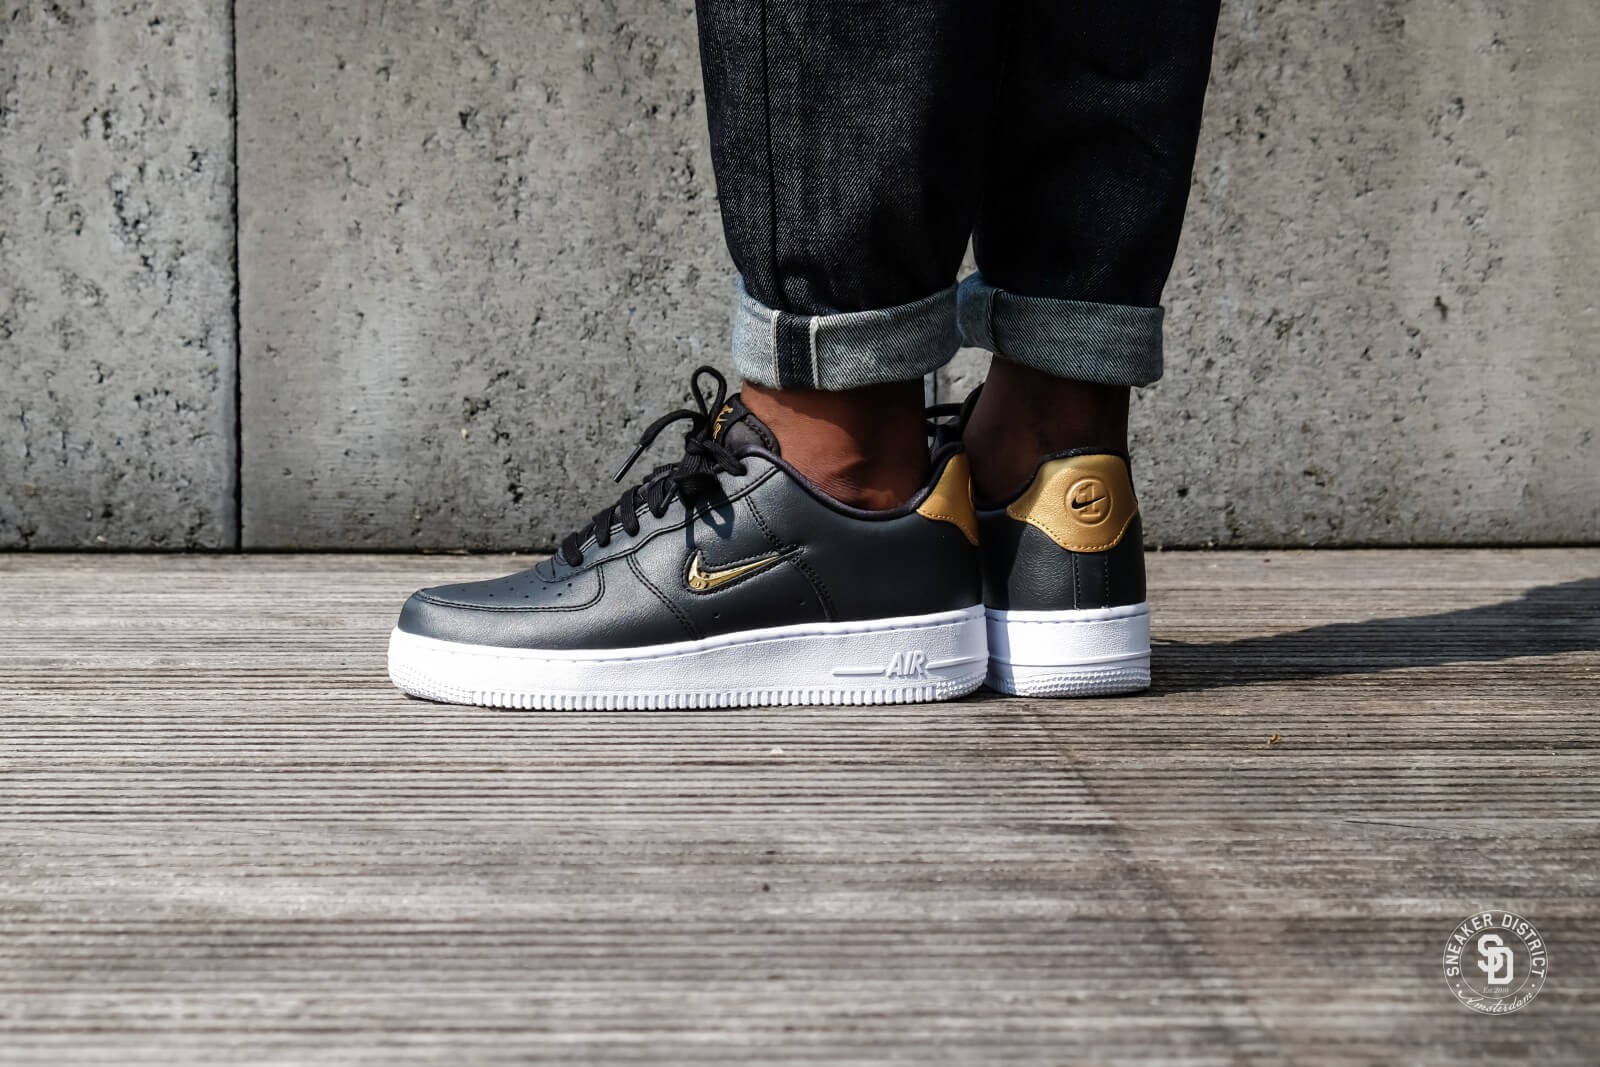 Nike Air Force 1 07 Lv8 Leather Black Metallic Gold White